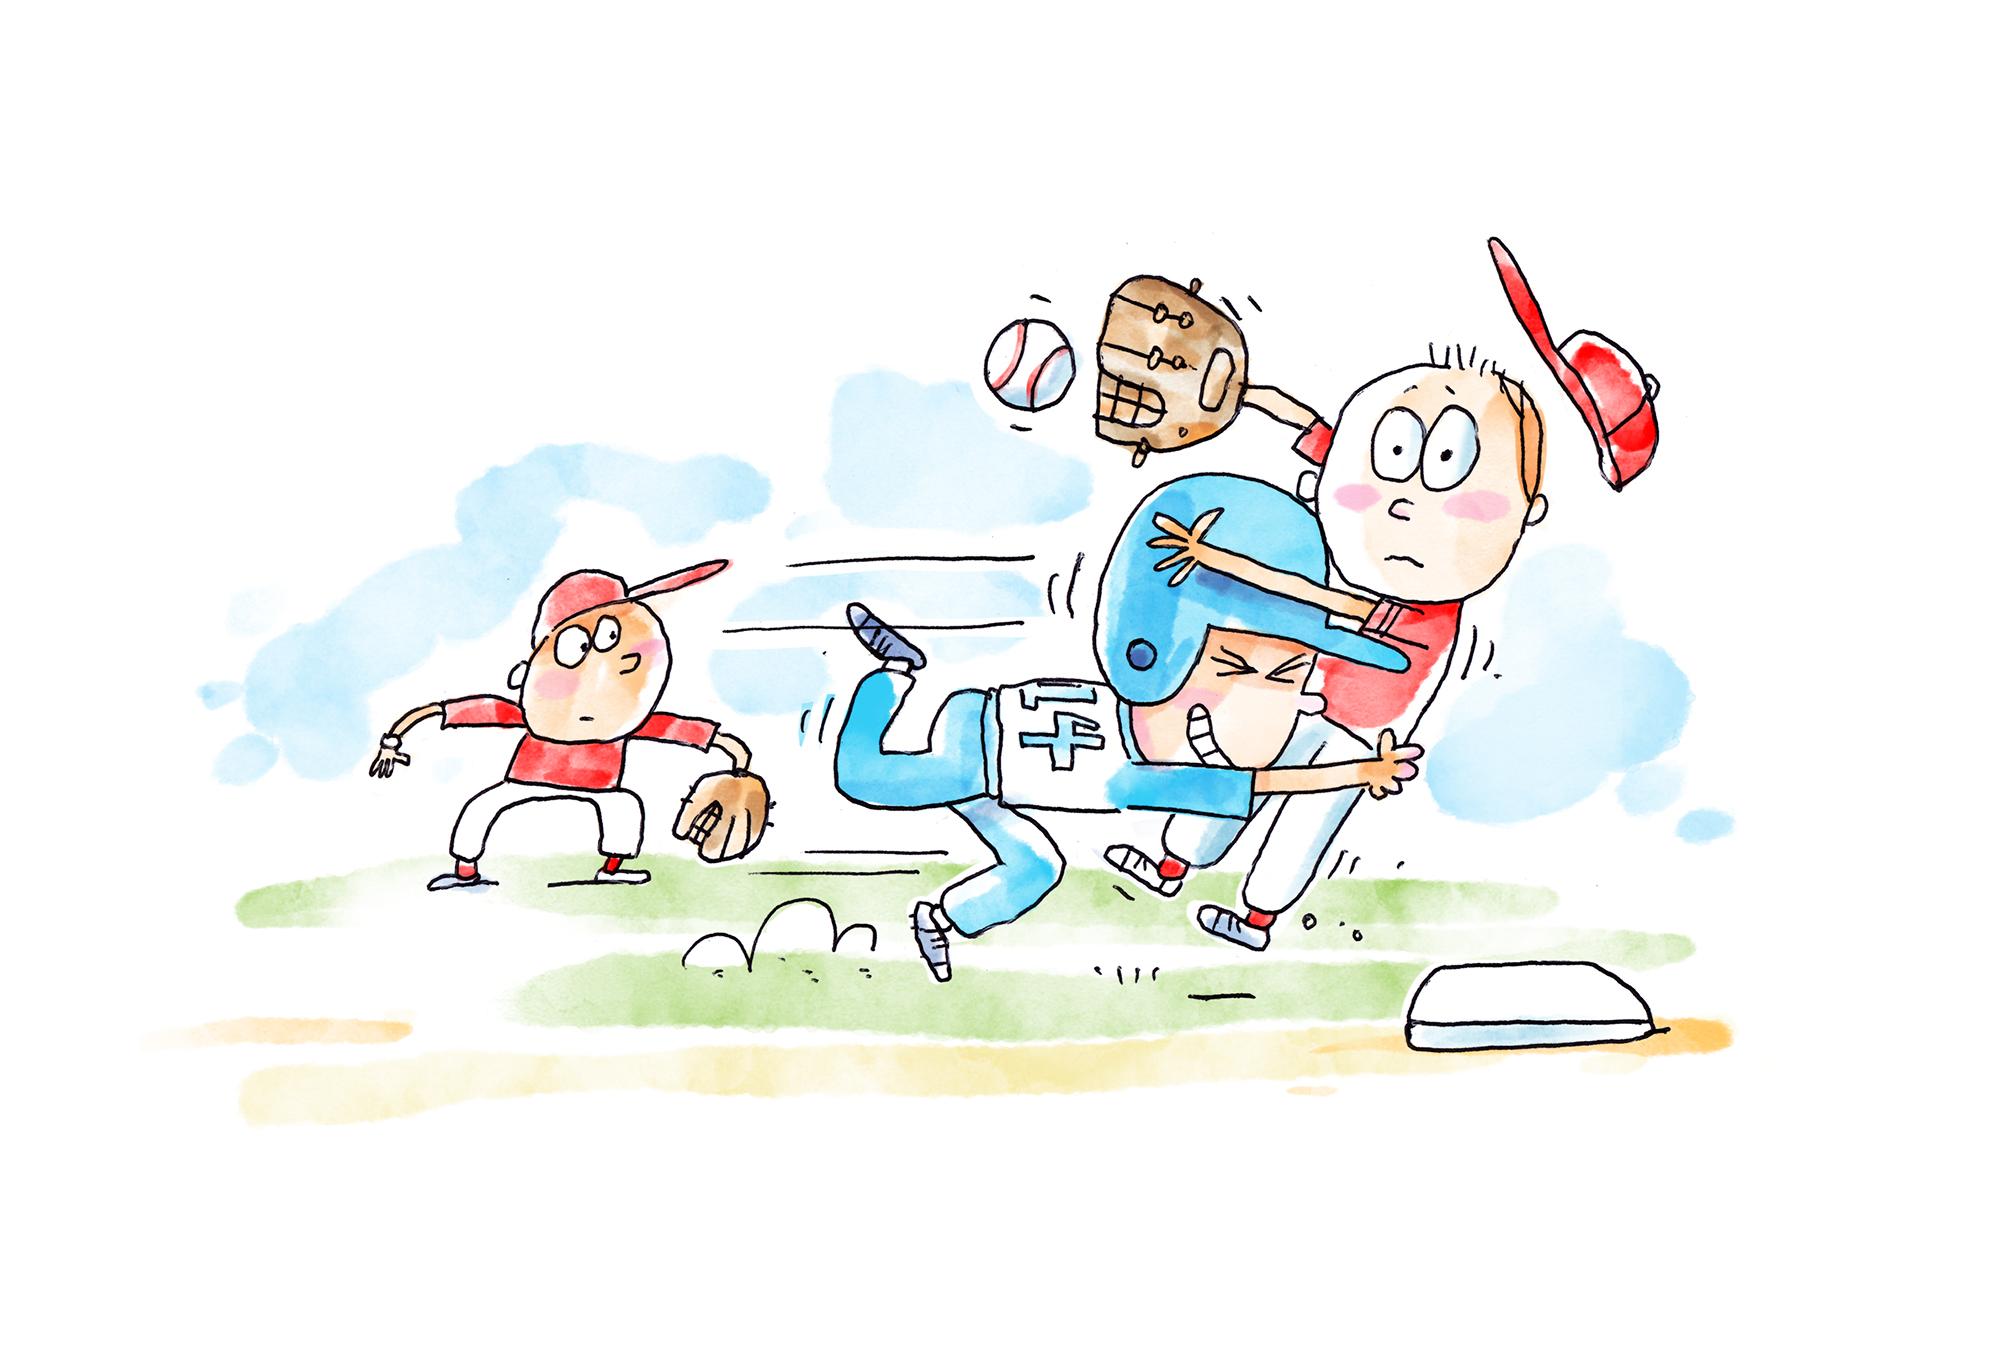 tackle_t_ball.jpg